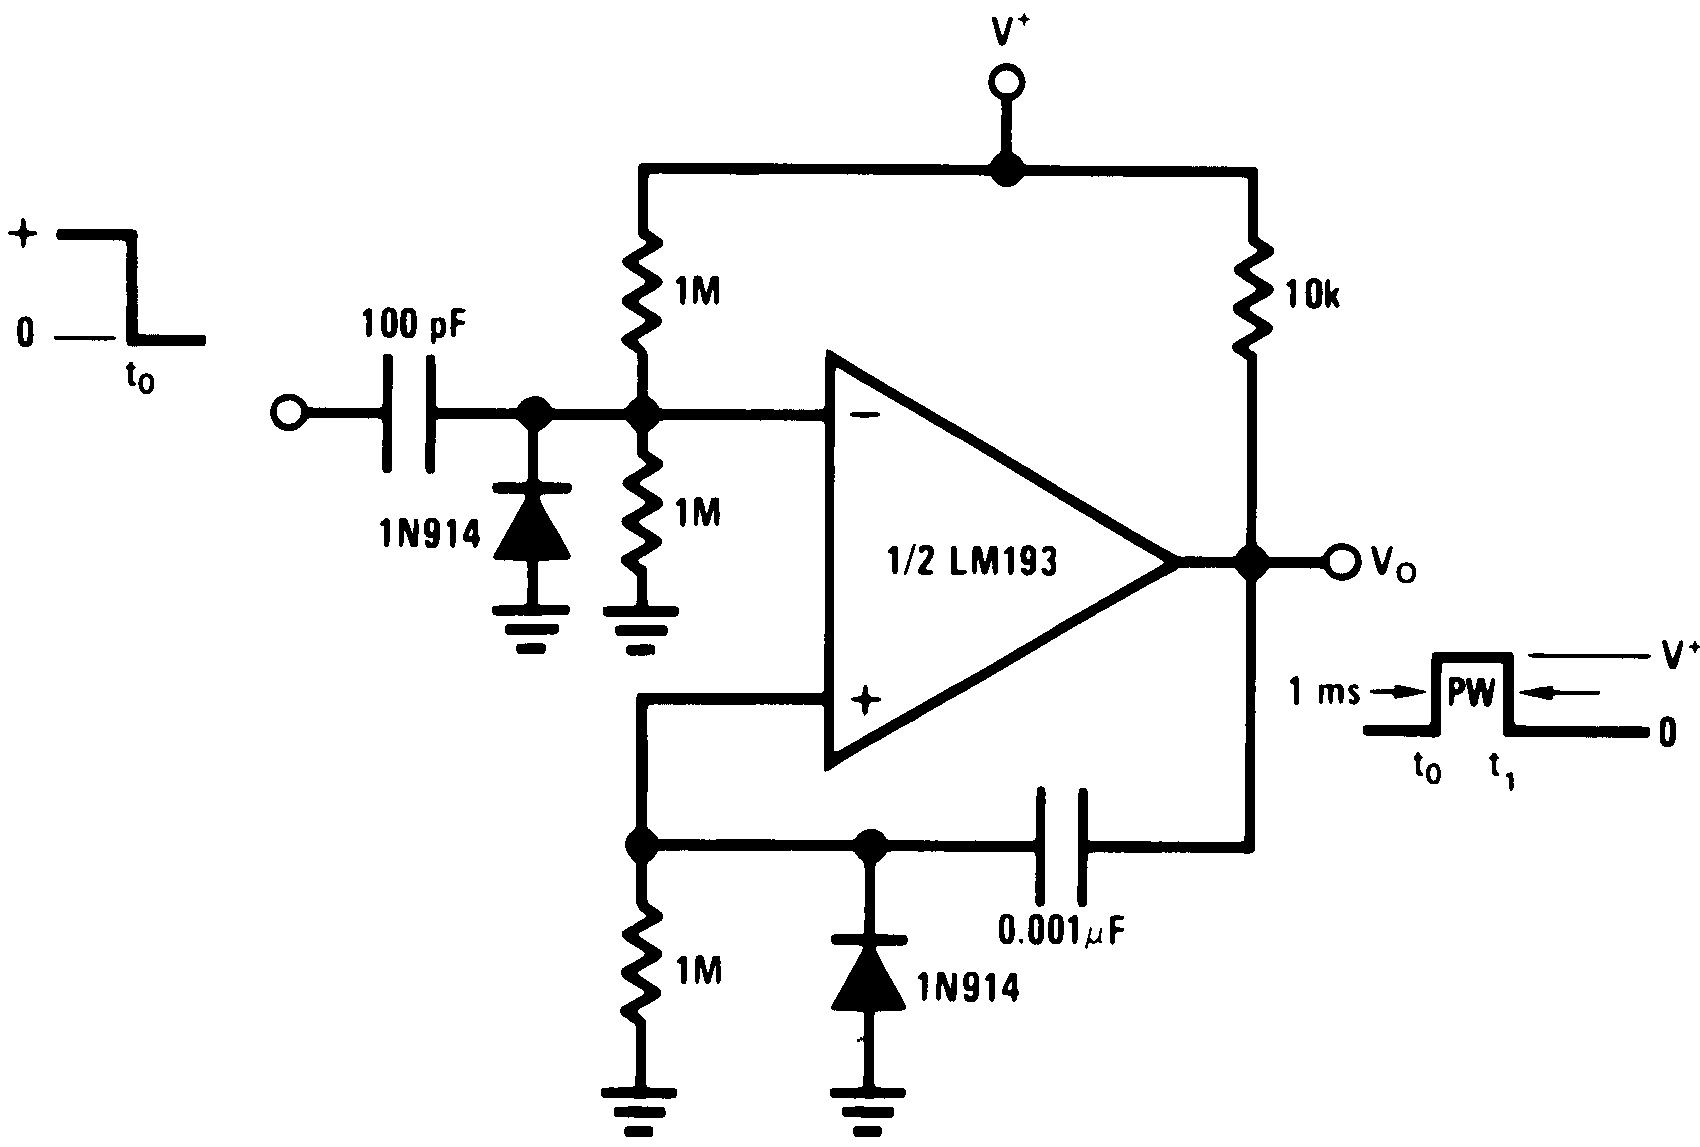 Lm2903 N 555 Timer Monostable Oneshot Circuit Lm193 Lm293 Lm393 00570922 Figure 32 One Shot Multivibrator